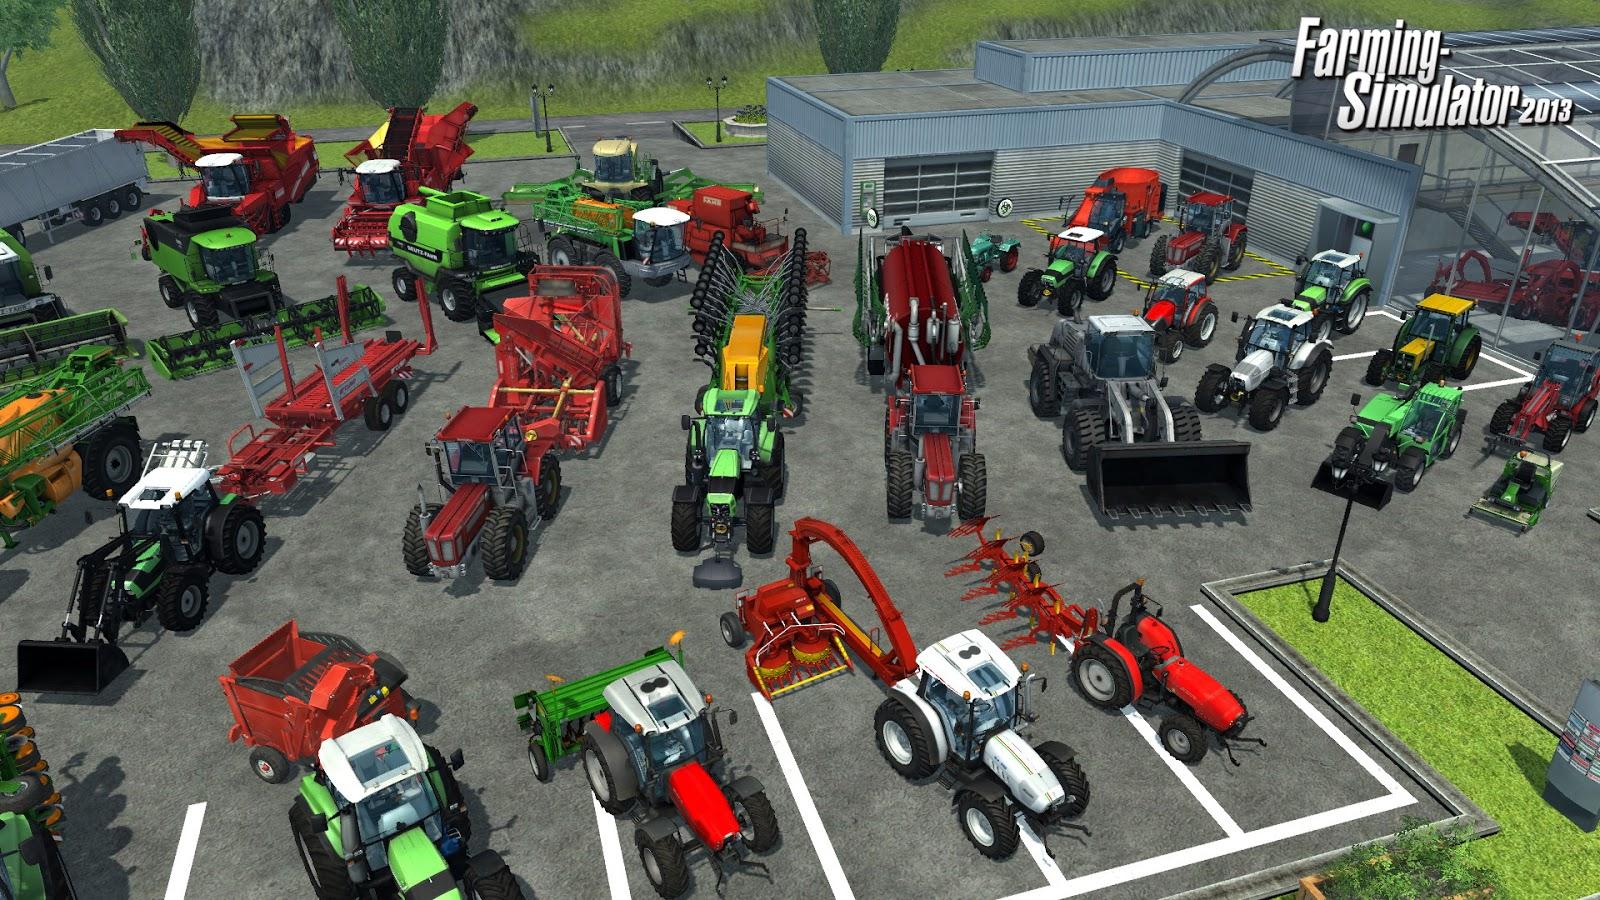 Farming Simulator 2013 Game - Free Download Full Version For PC